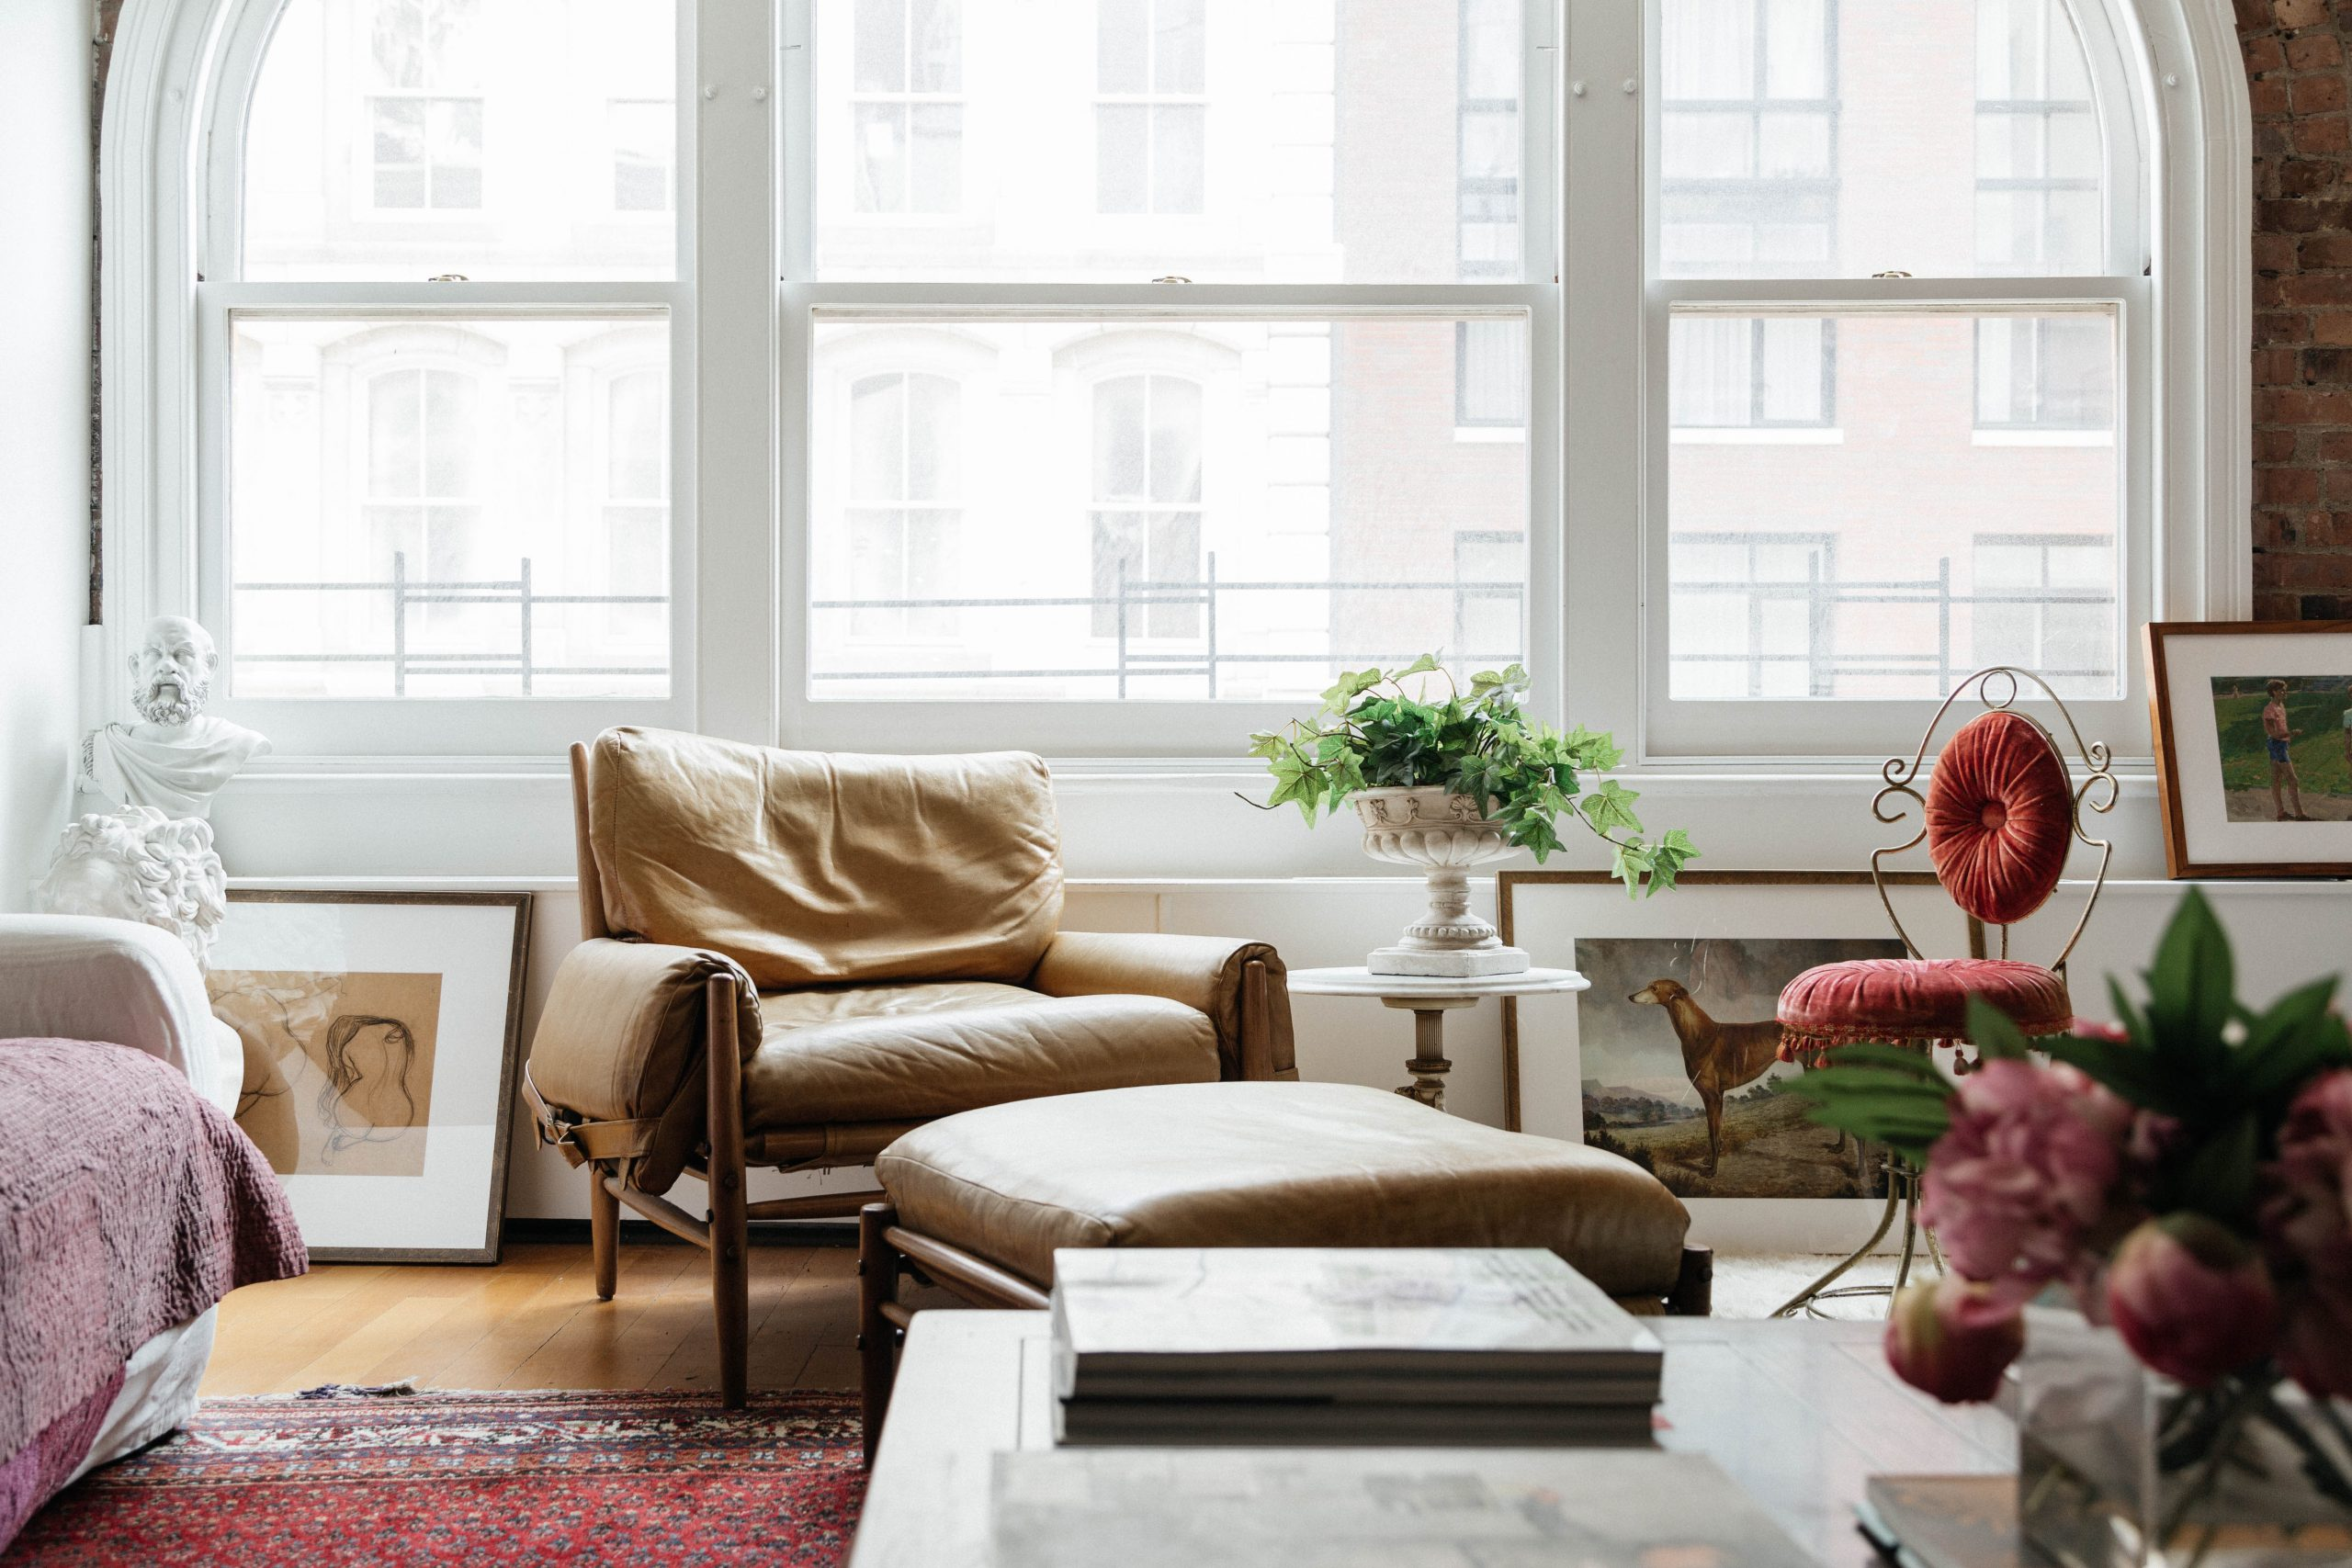 Jae Joo Tribeca loft living room